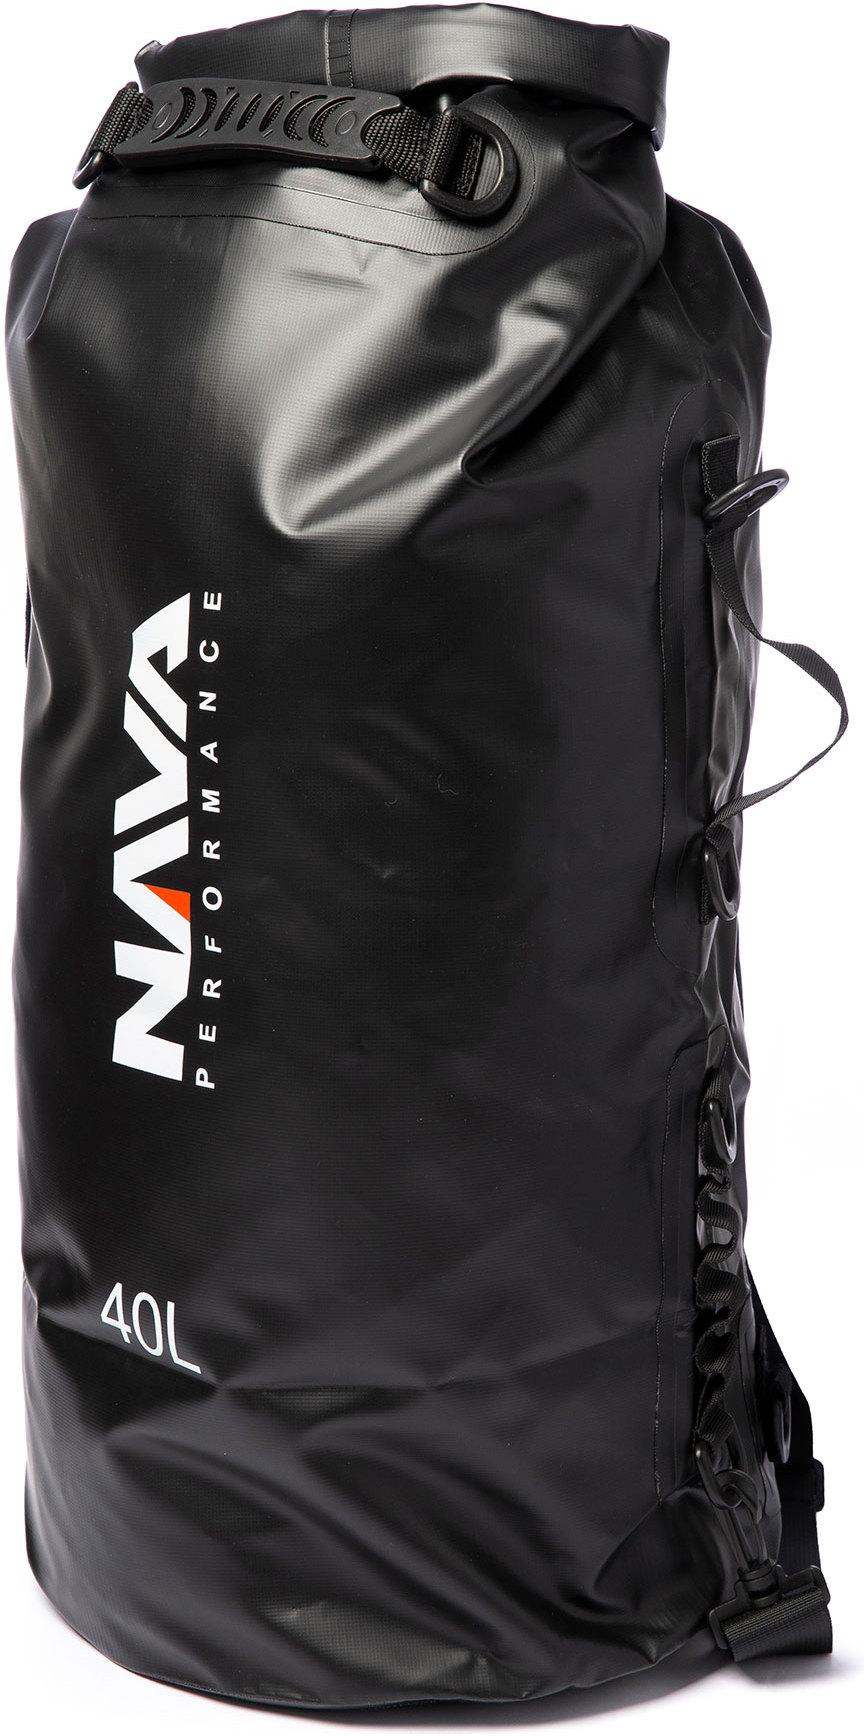 2020 Nava Performance Drybag Con Correas De Mochila Nava005 - Negro